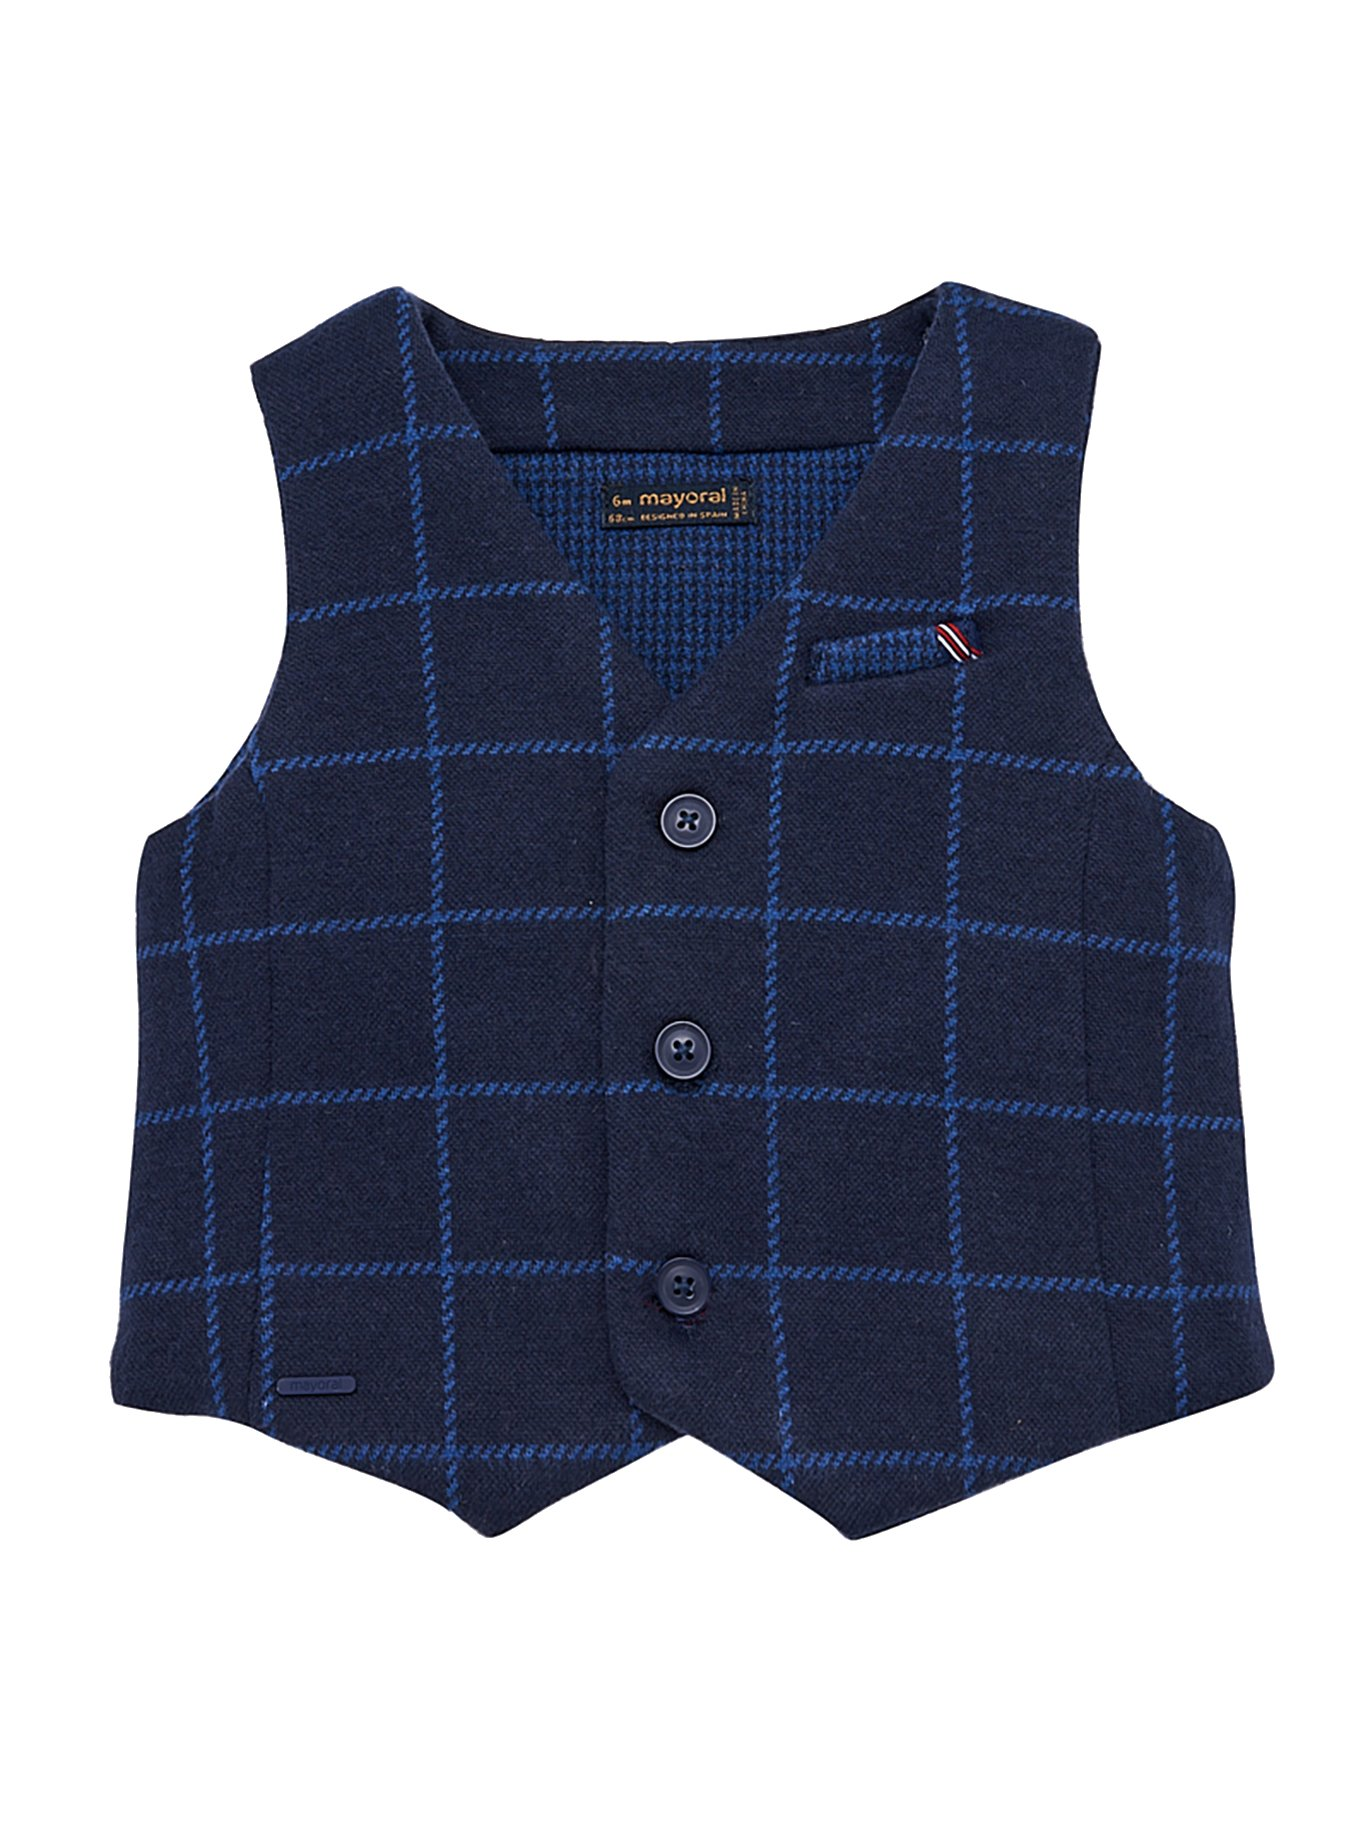 Mayoral 18-02458-010 - Dressy Vest for Baby-Boys 18 Months Dark by Mayoral